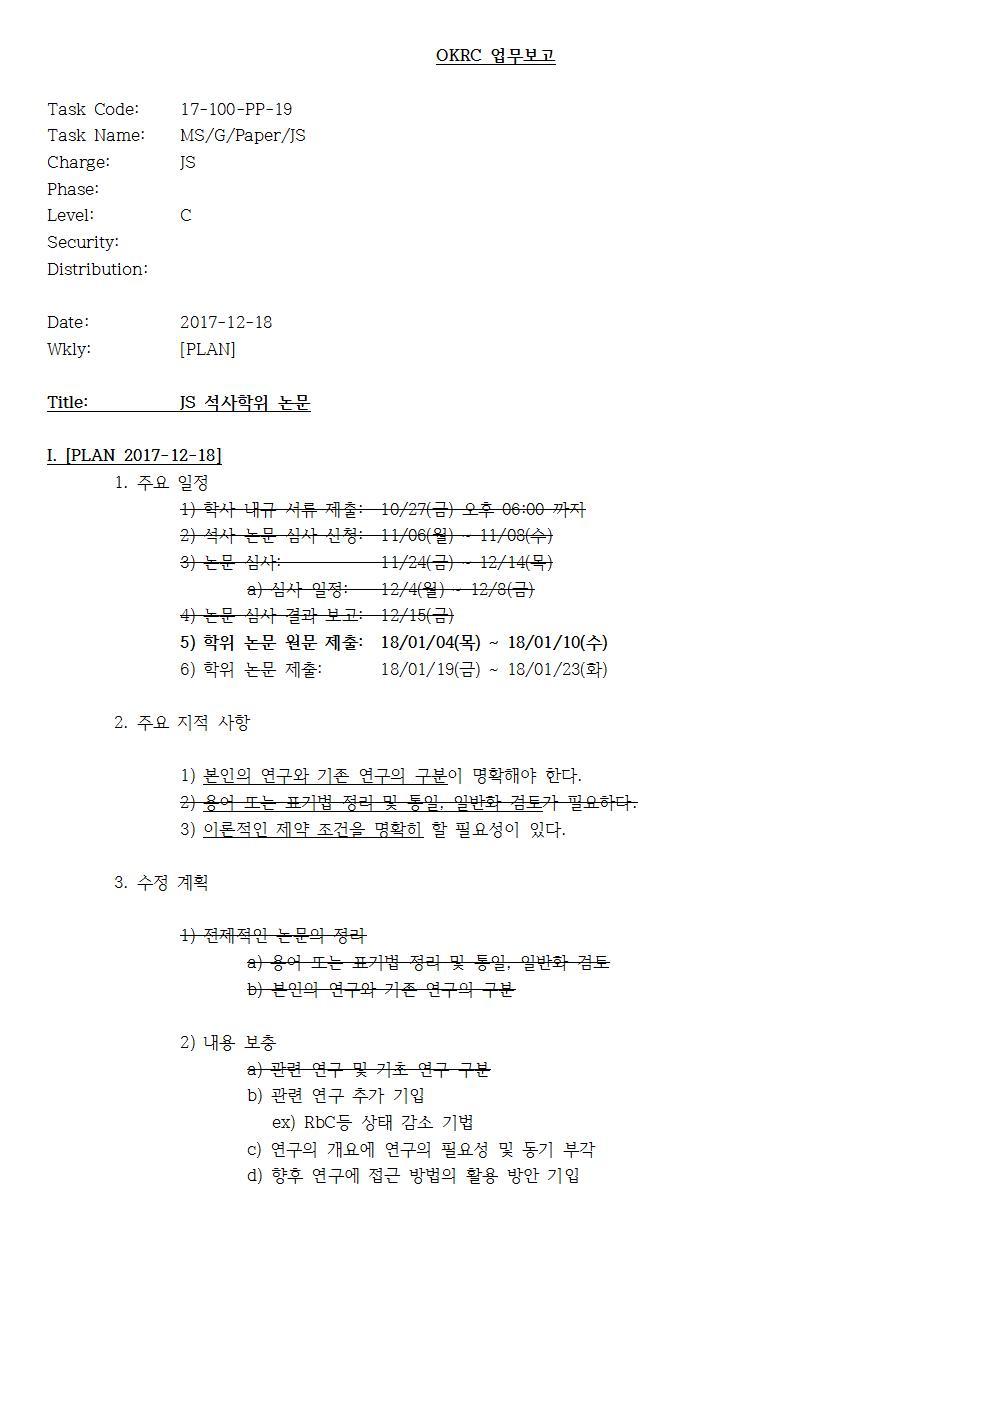 D-[17-100-PP-19]-[MS-G-Paper-JS]-[JS]-[2017-12-18]-[PLAN]001.jpg